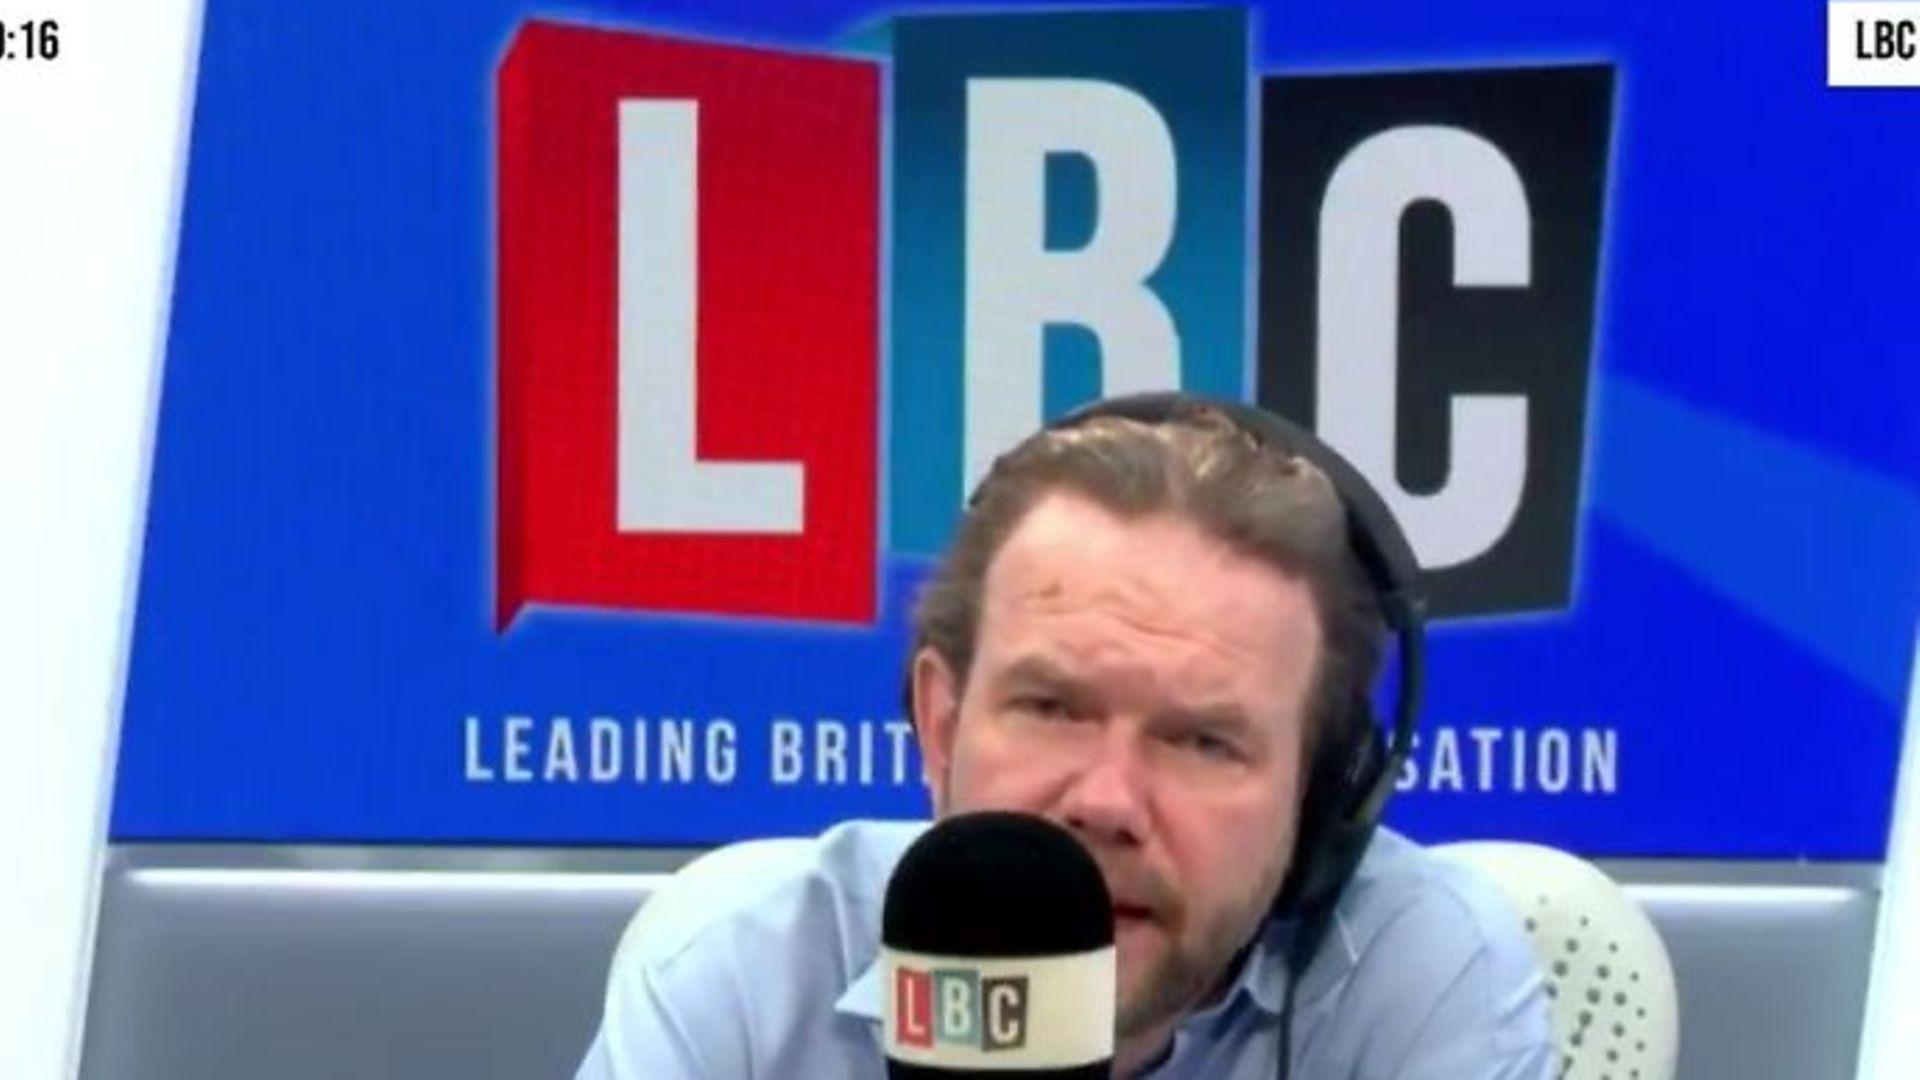 James O'Brien on LBC radio - Credit: Twitter, LBC radio